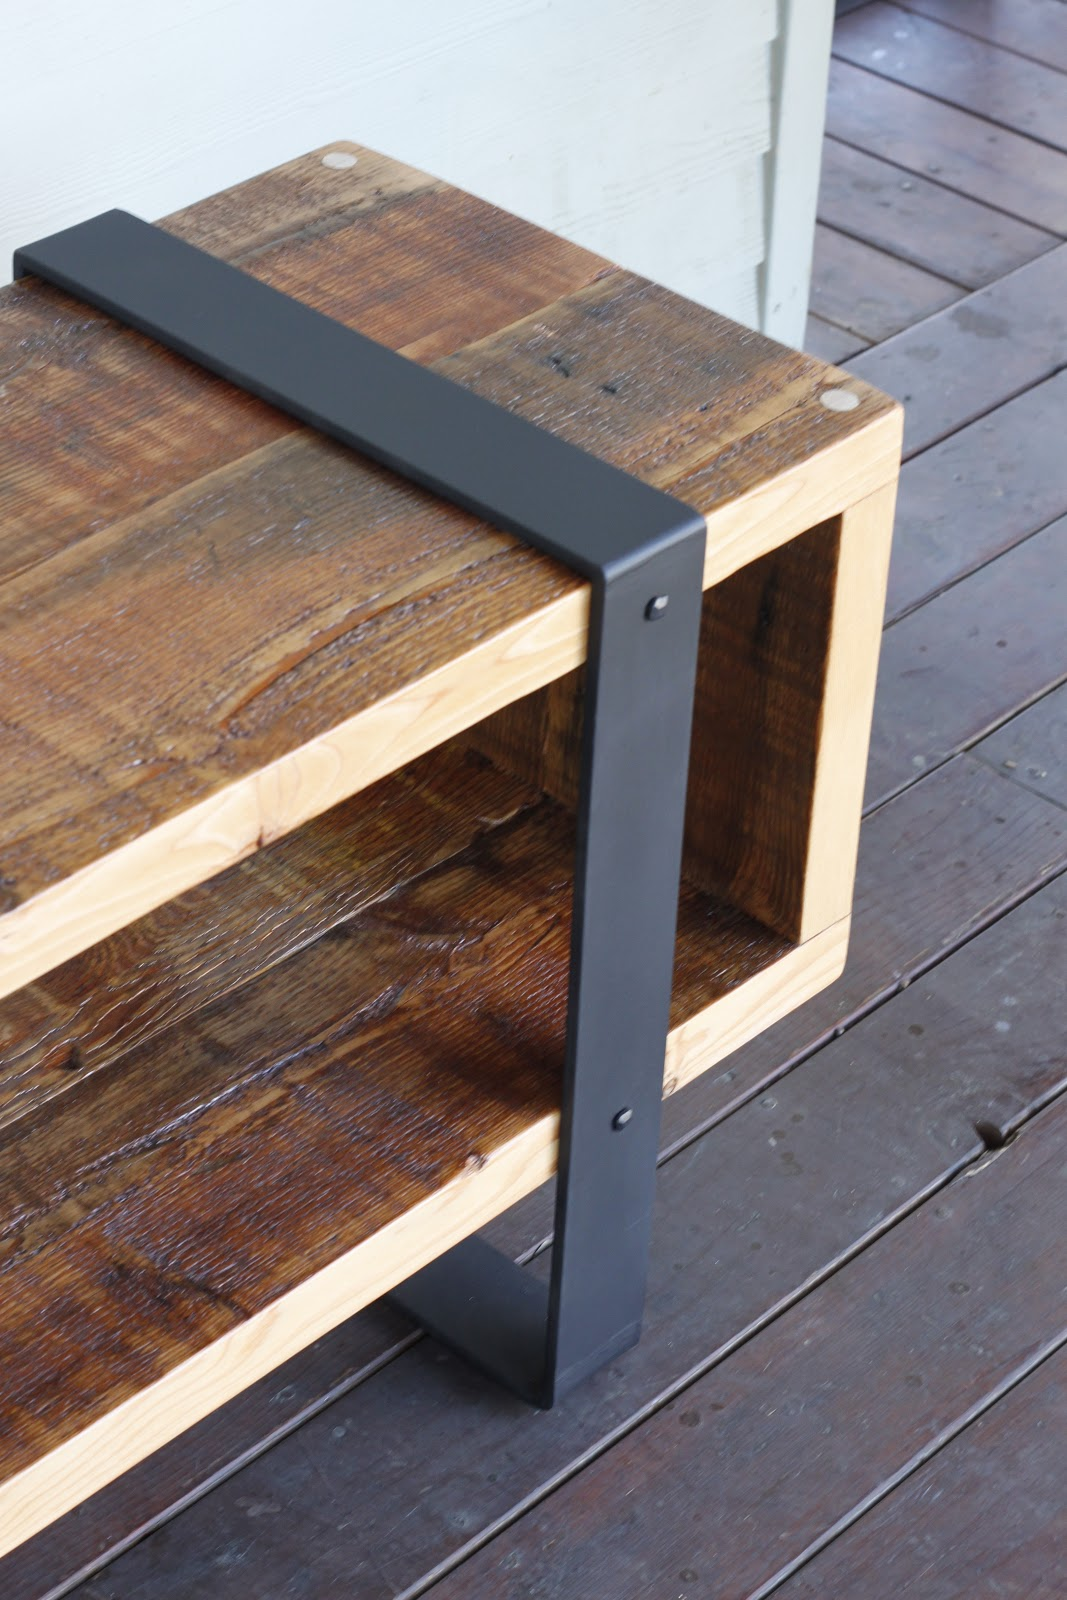 Wood And Metal Furniture | Furniture Design Ideas